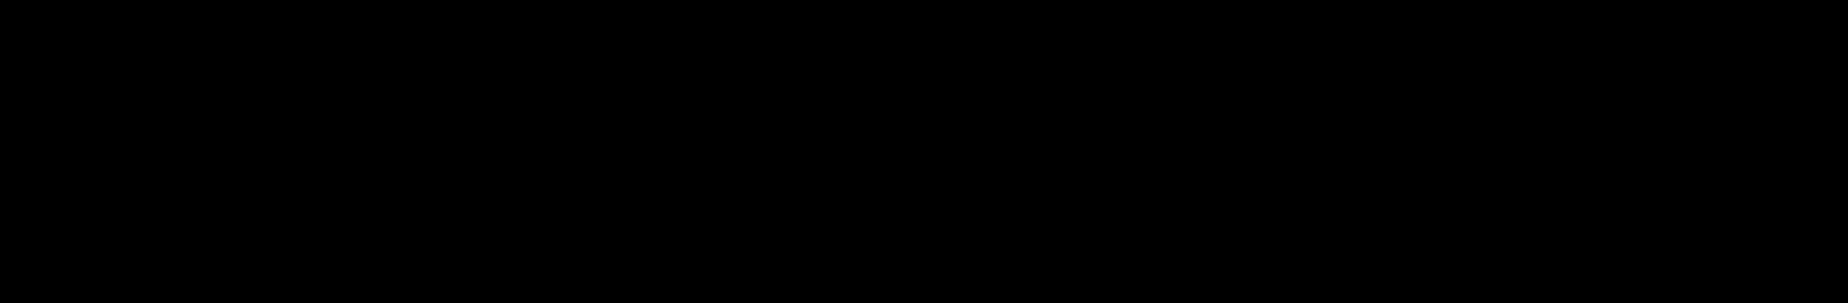 allg-divider